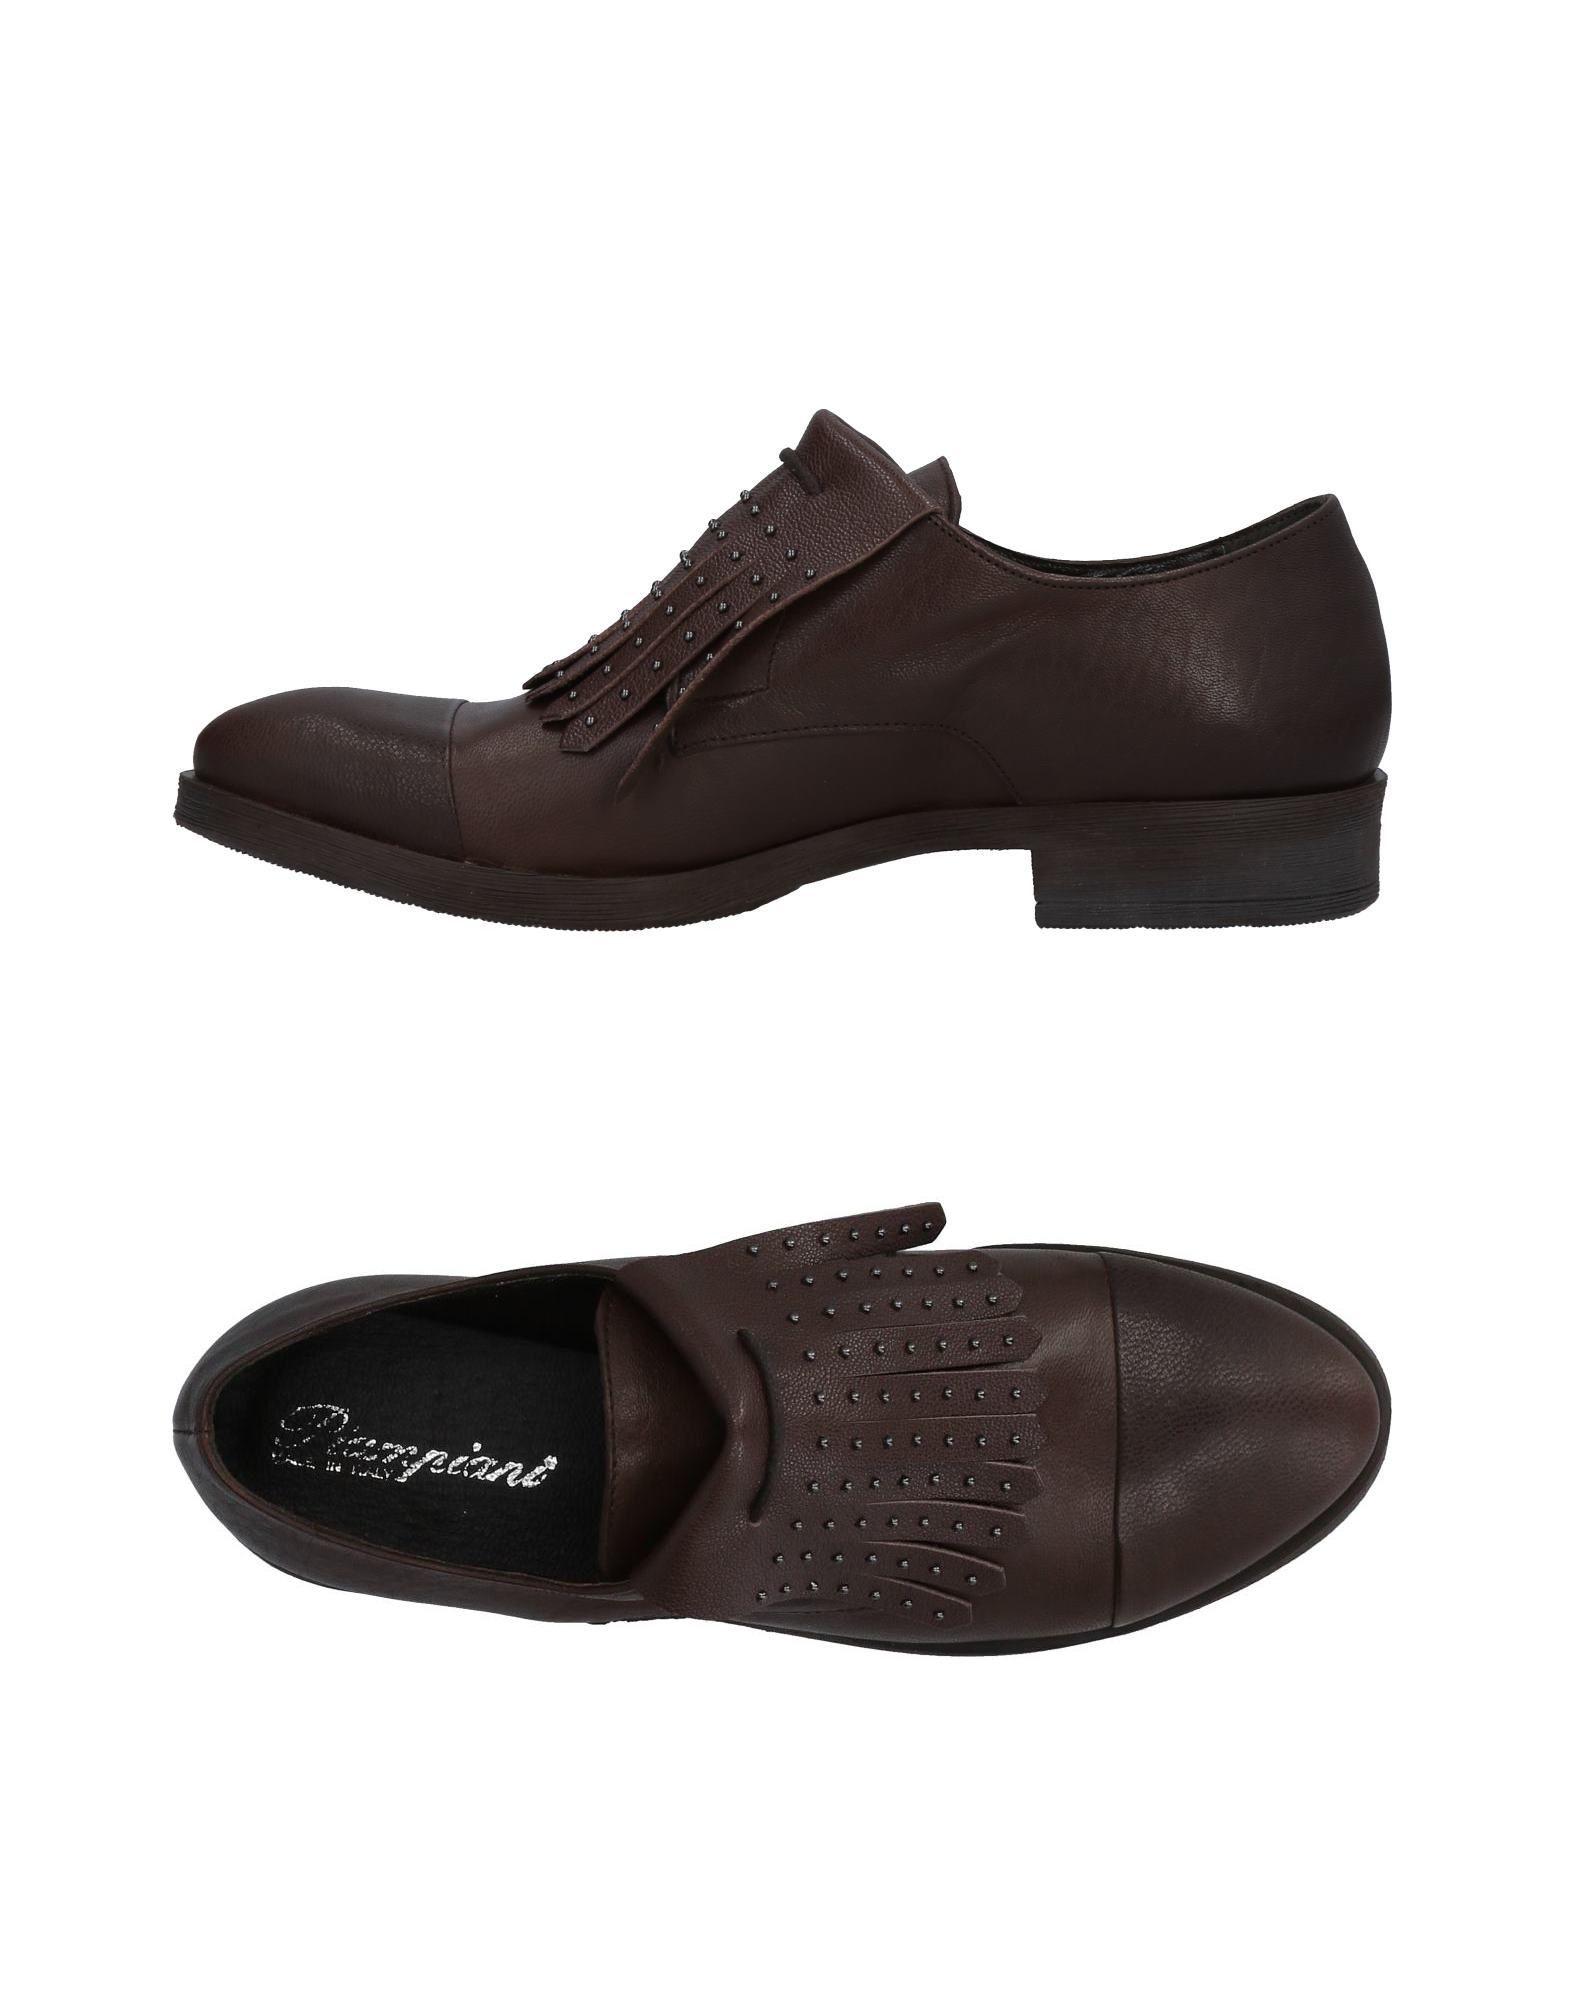 Piampiani Schnürschuhe Damen  11491232HX Gute Qualität beliebte Schuhe